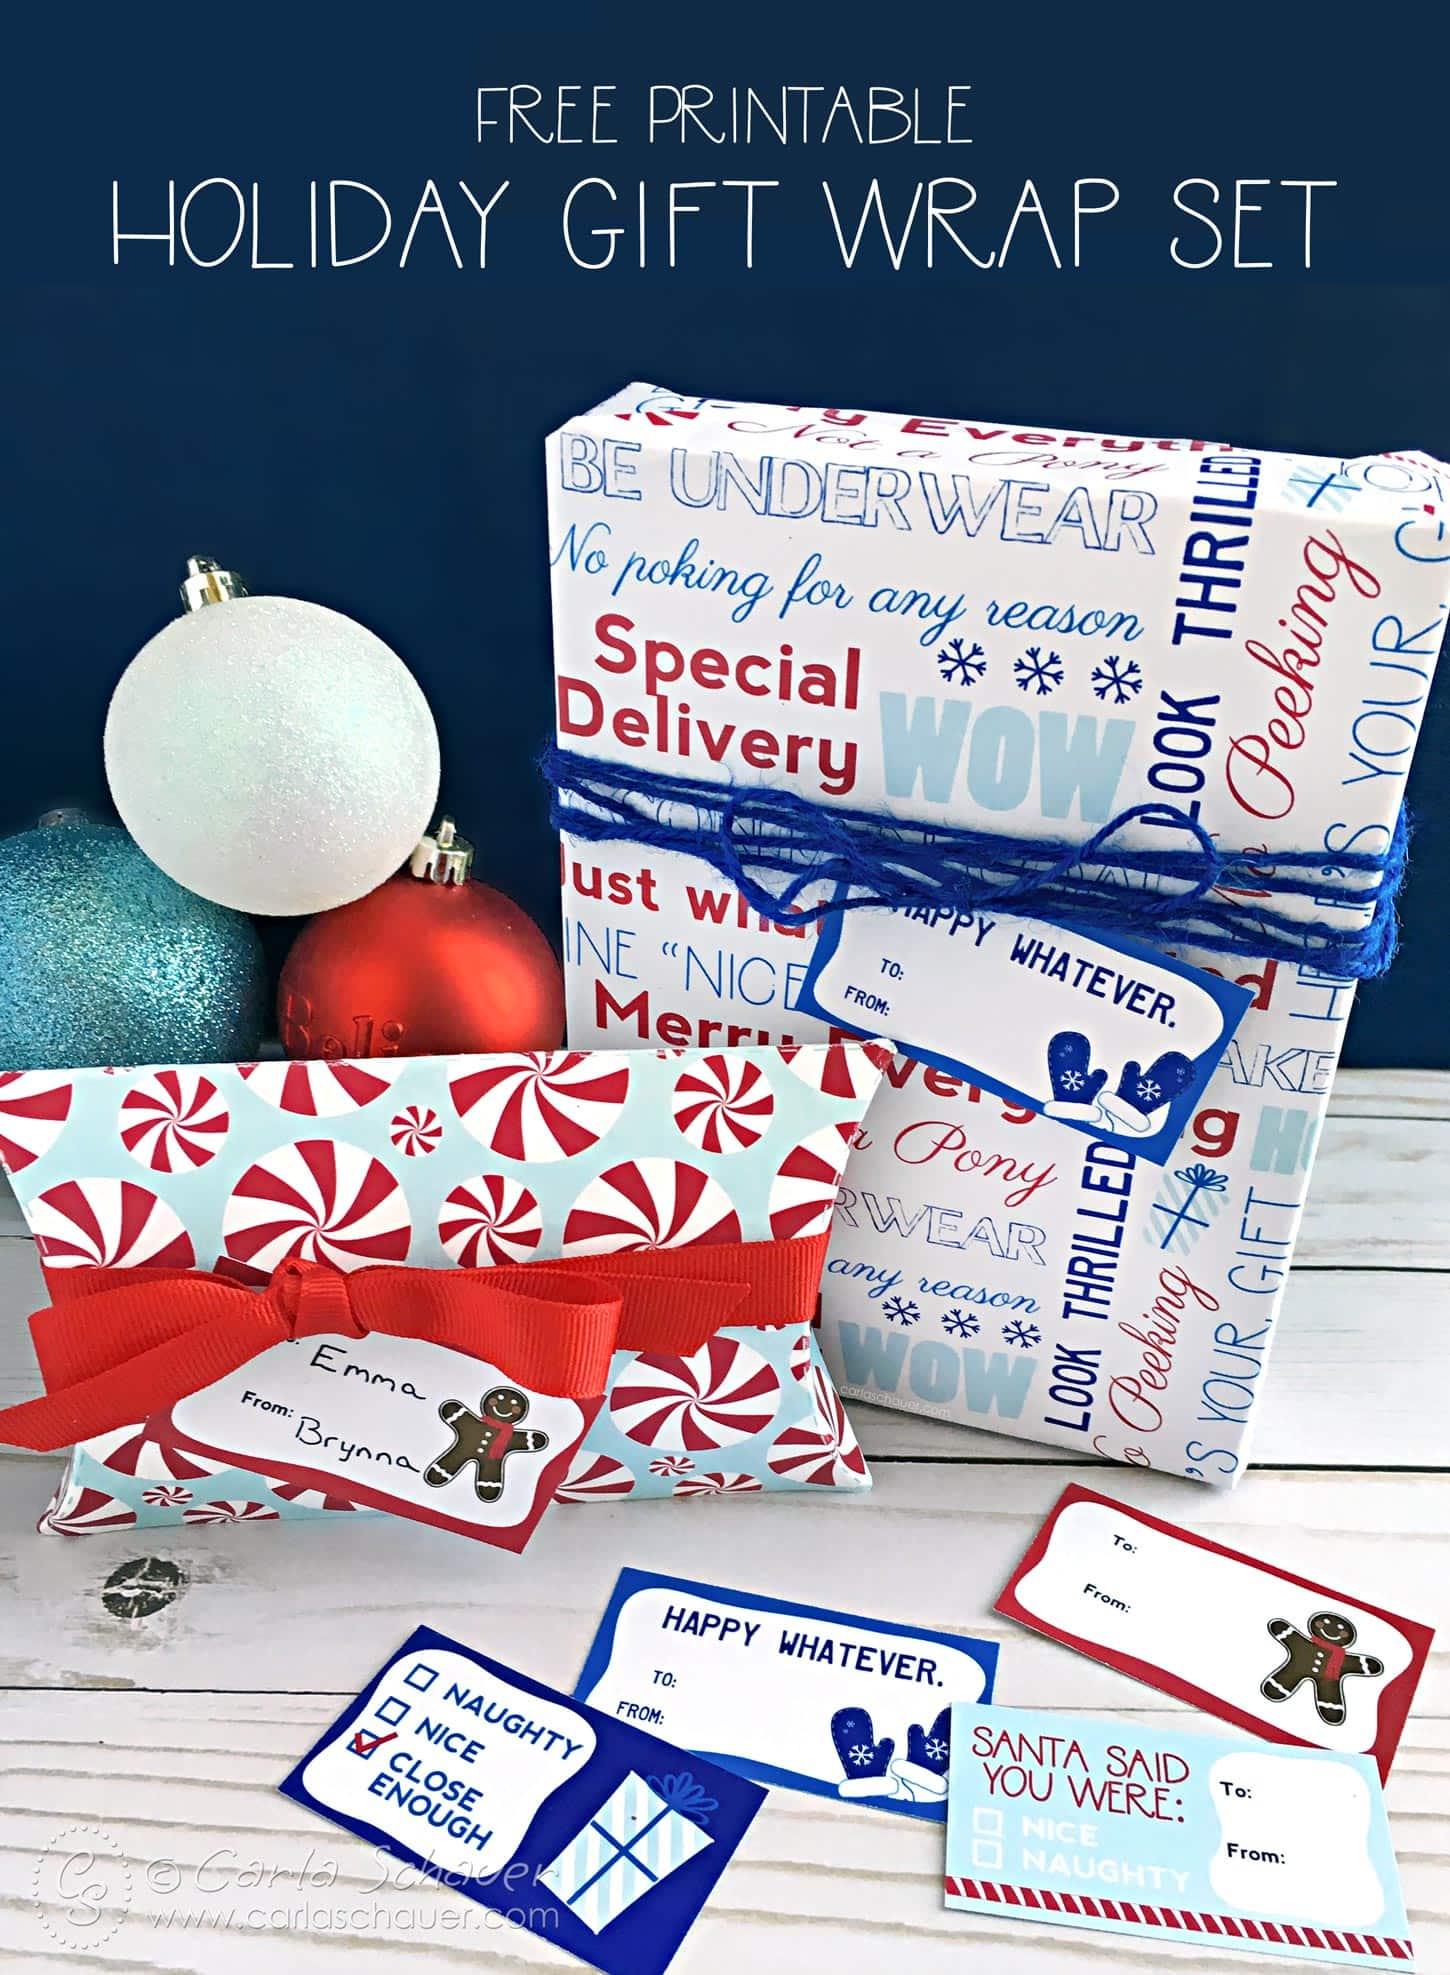 Printable Holiday Gift Wrap Set Carla Schauer Designs